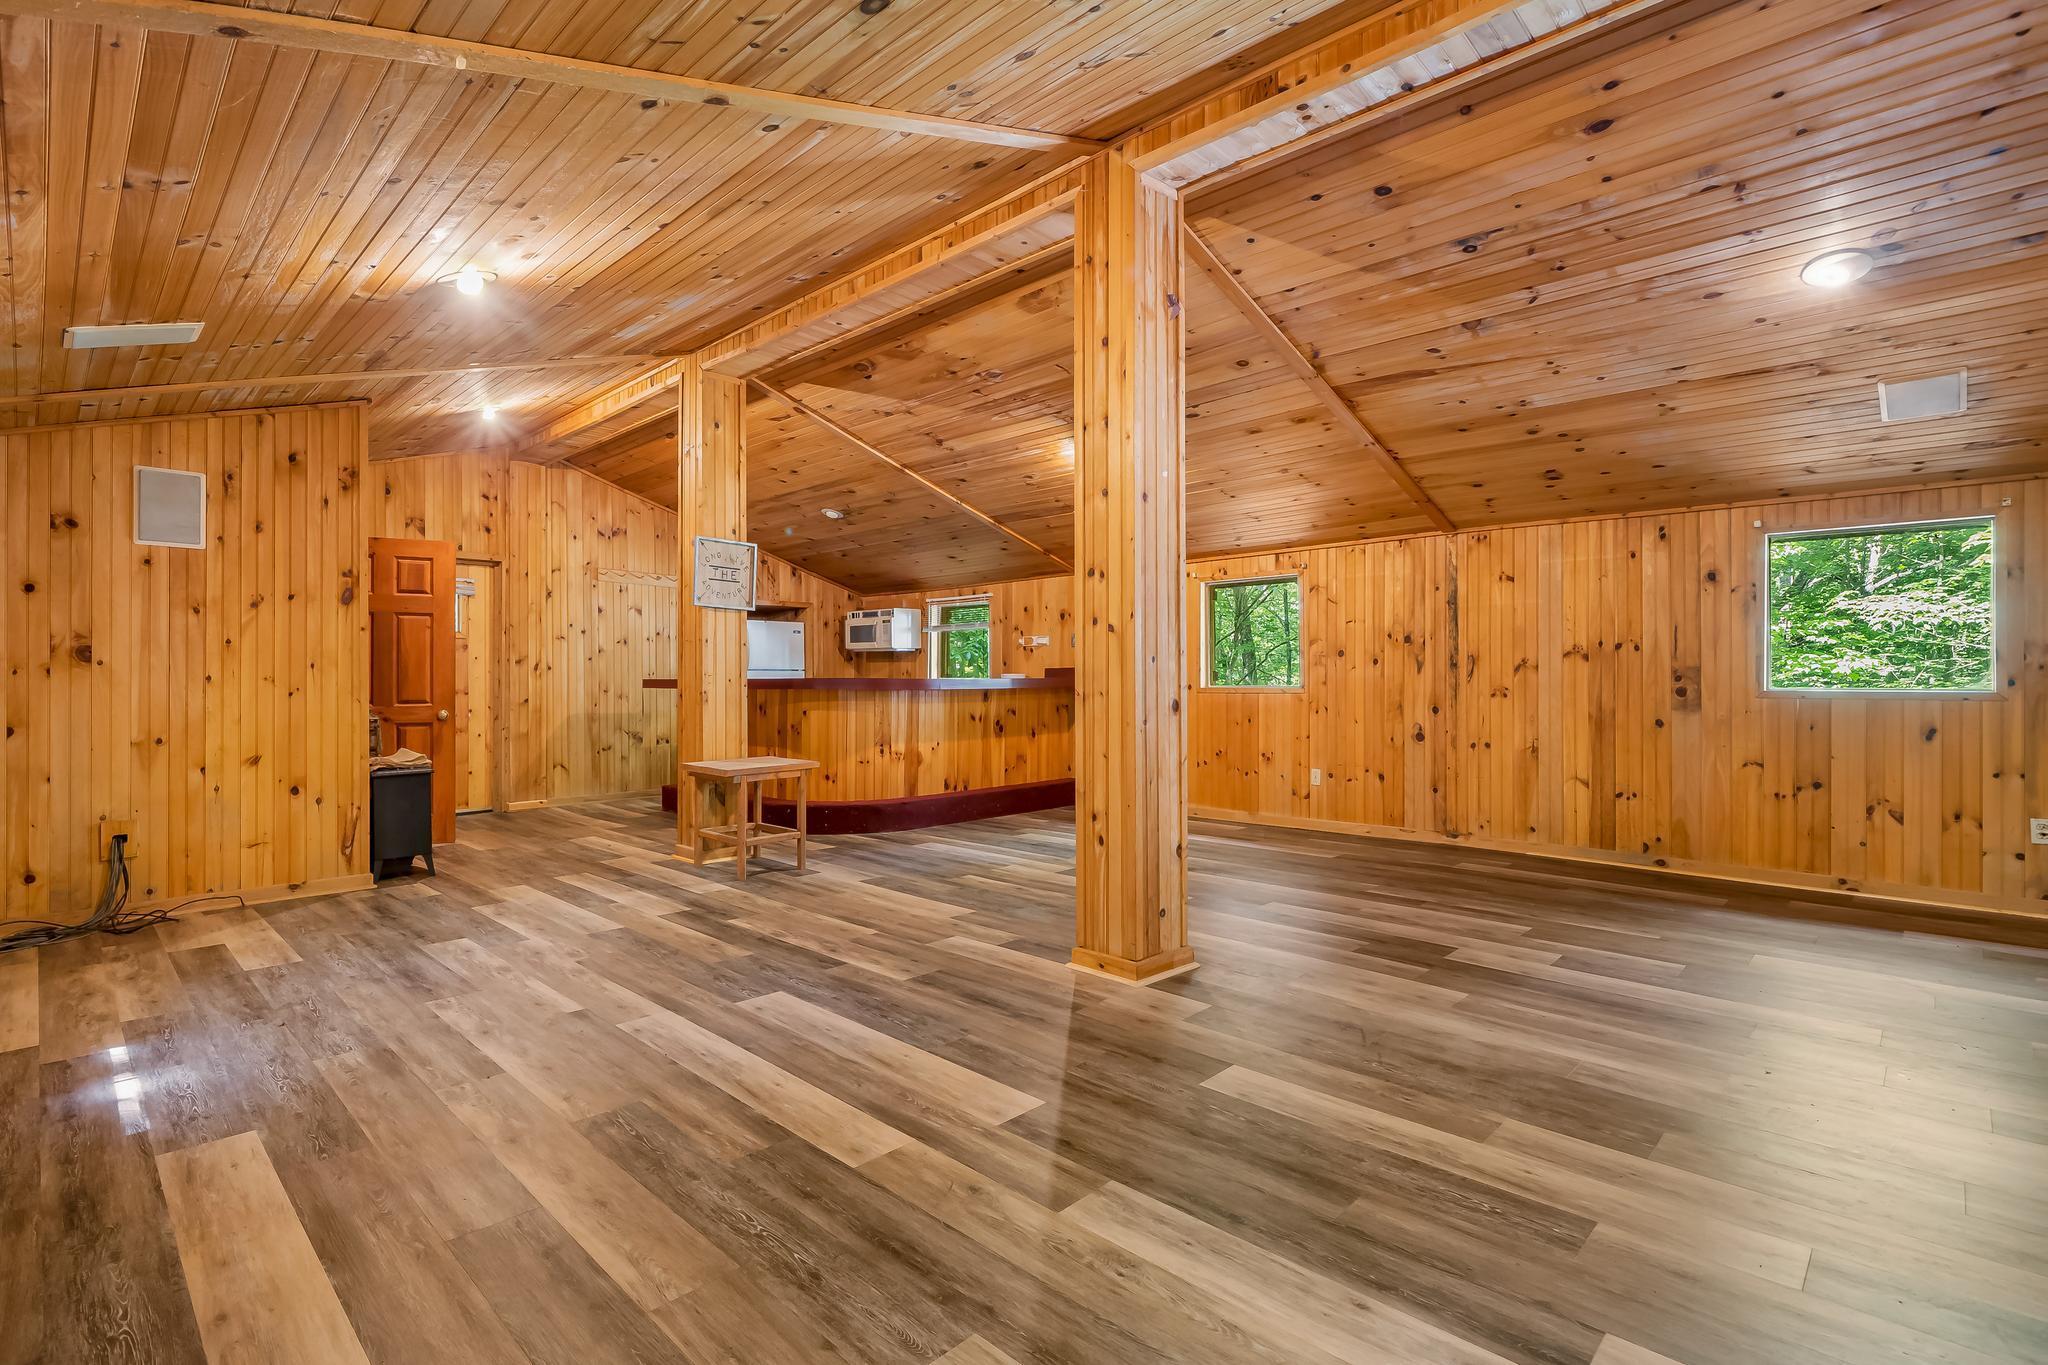 780 Bill Icenhour Lane Lodge (10 of 22)